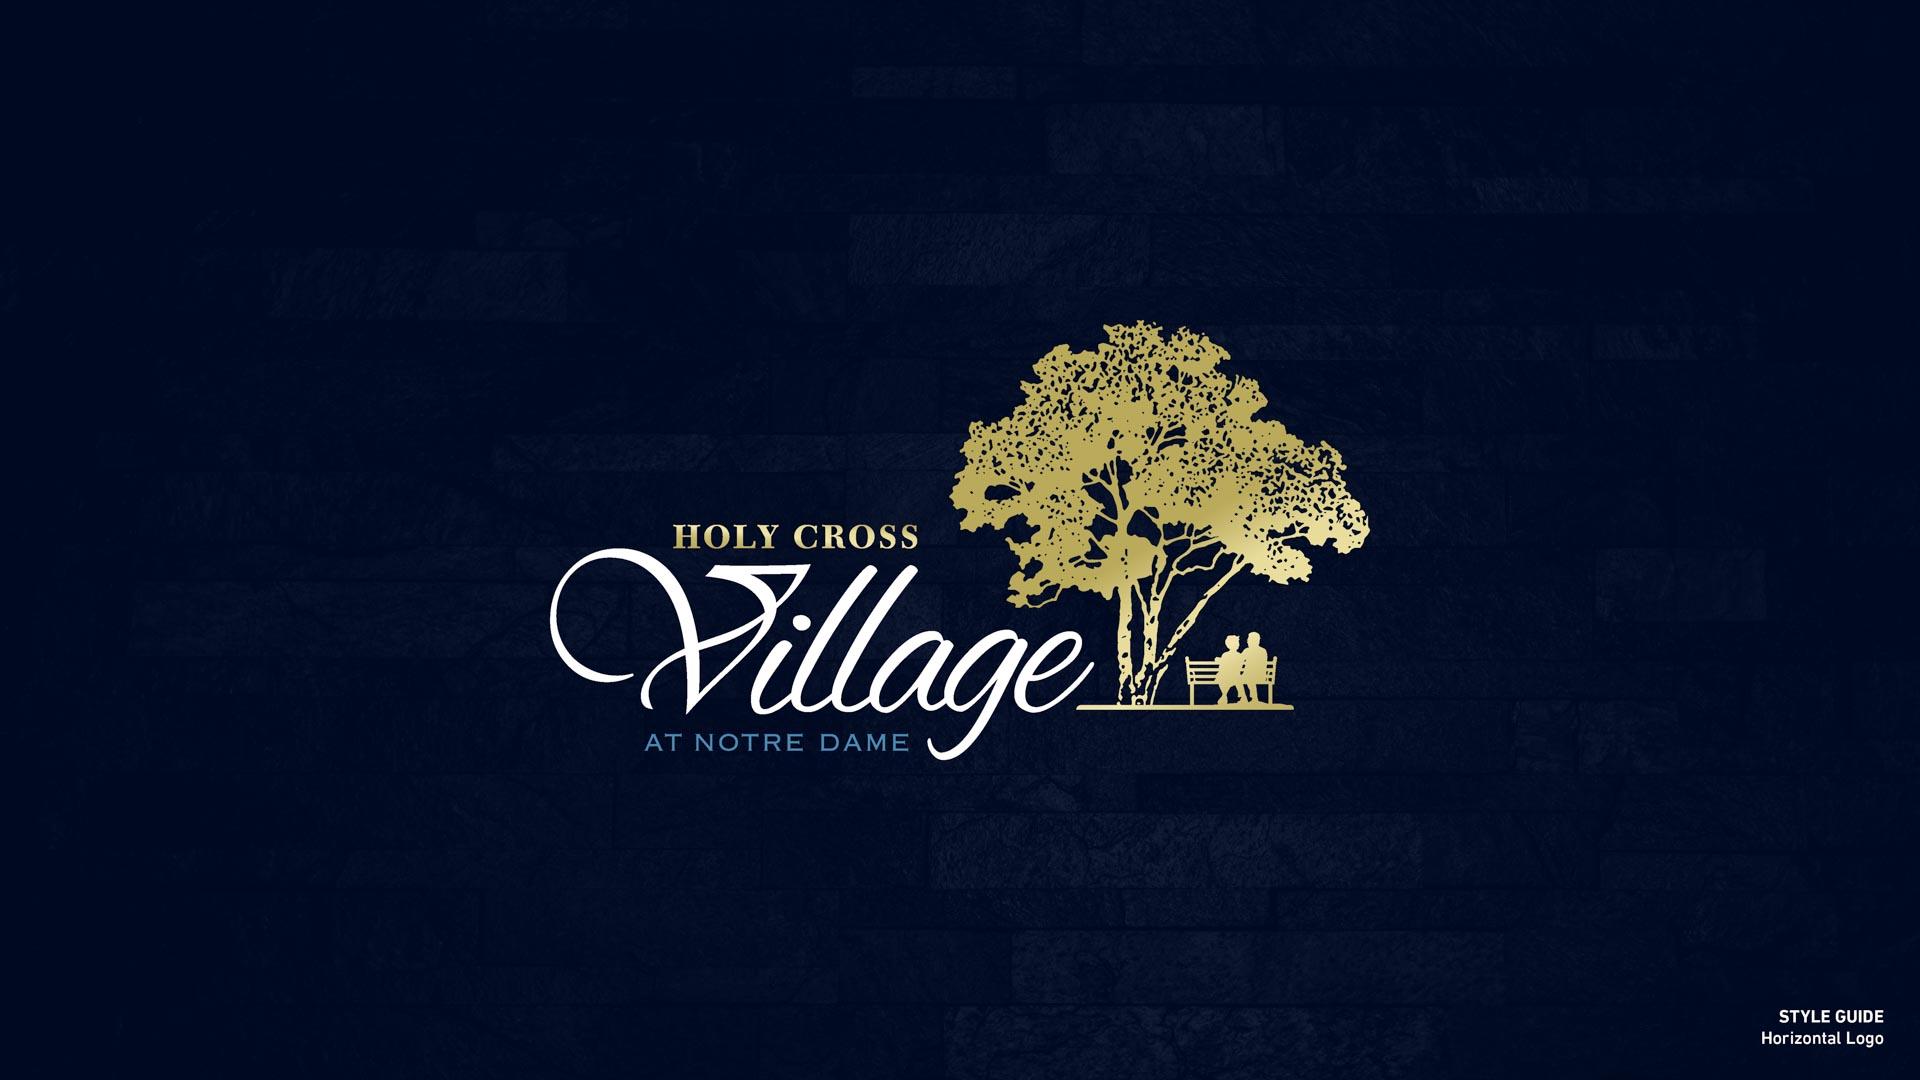 Holy Cross Village's Horizontal Logo